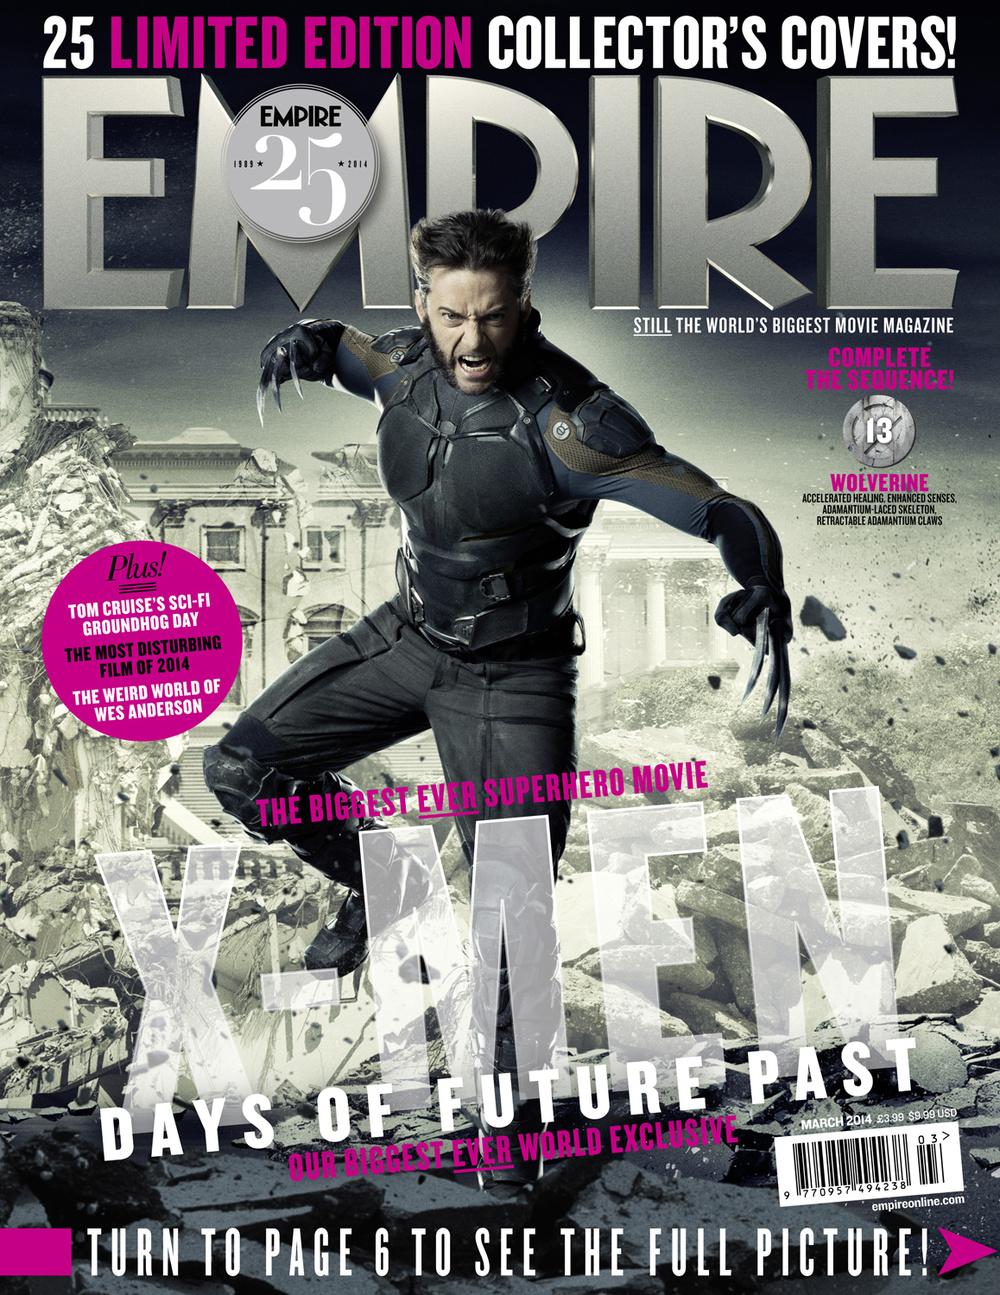 X-MEN DAYS OF FUTURE PAST Empire Magazine Covers  (5)